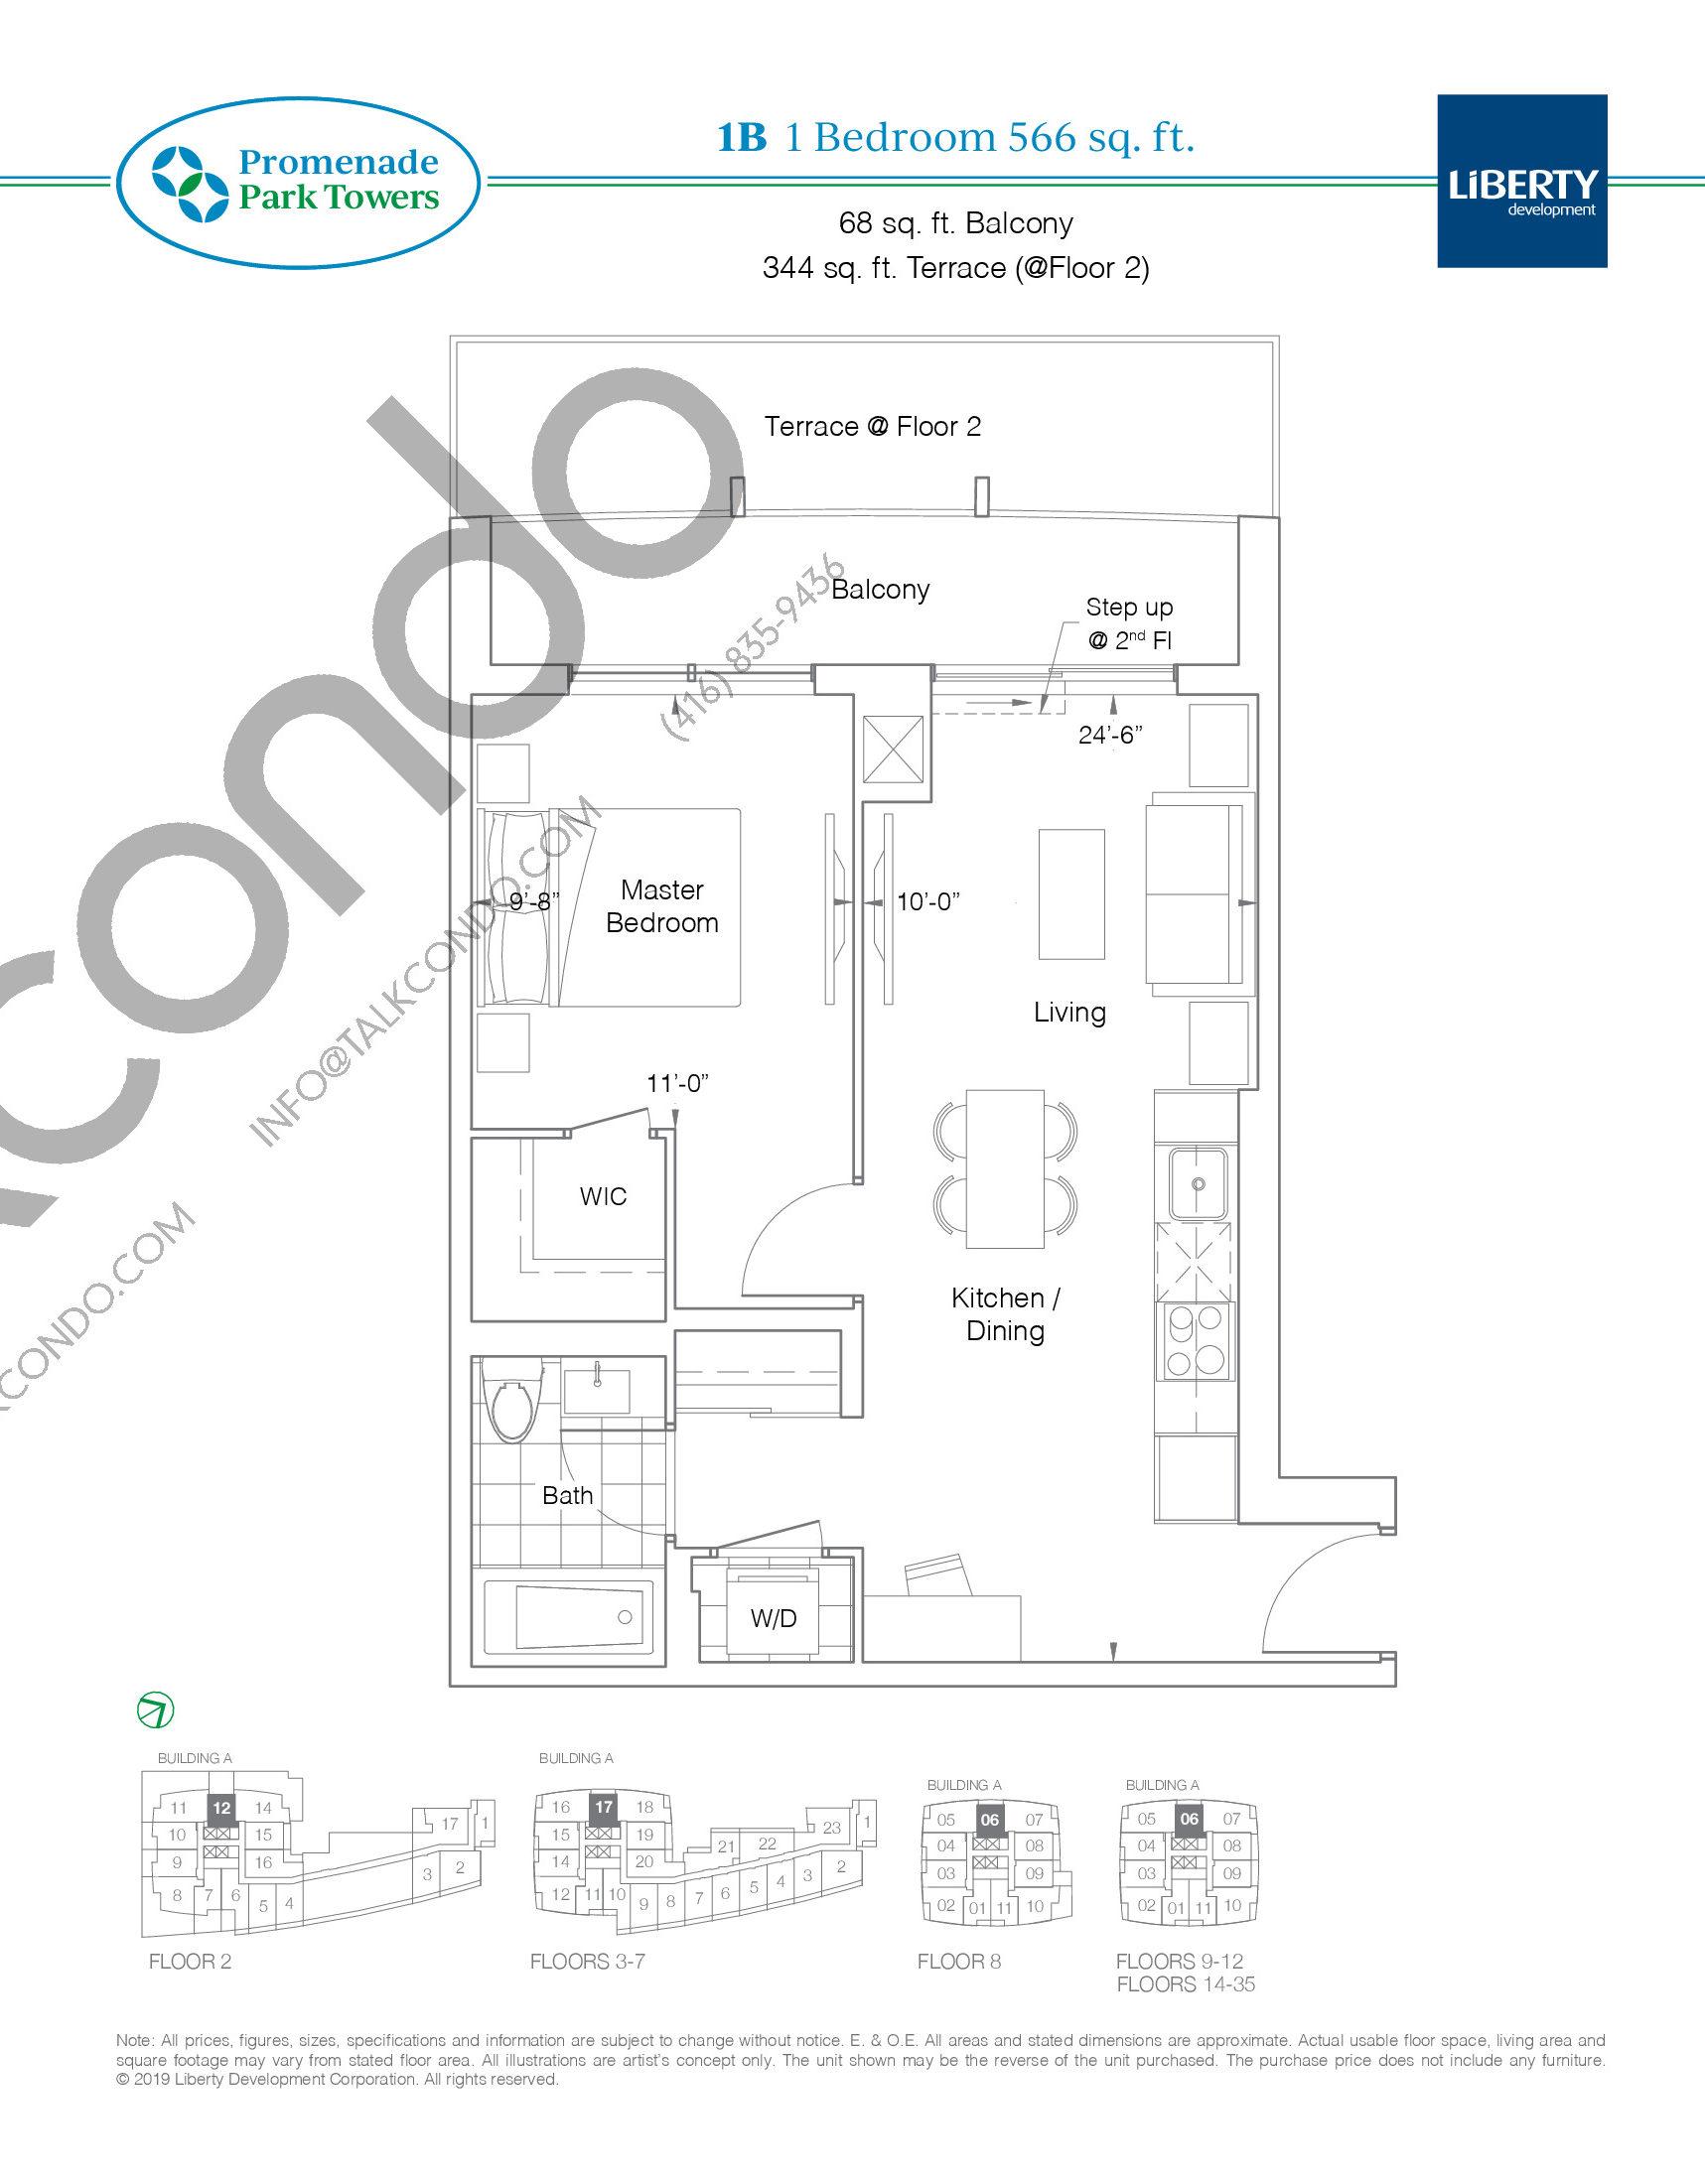 1B Floor Plan at Promenade Park Towers Condos - 566 sq.ft